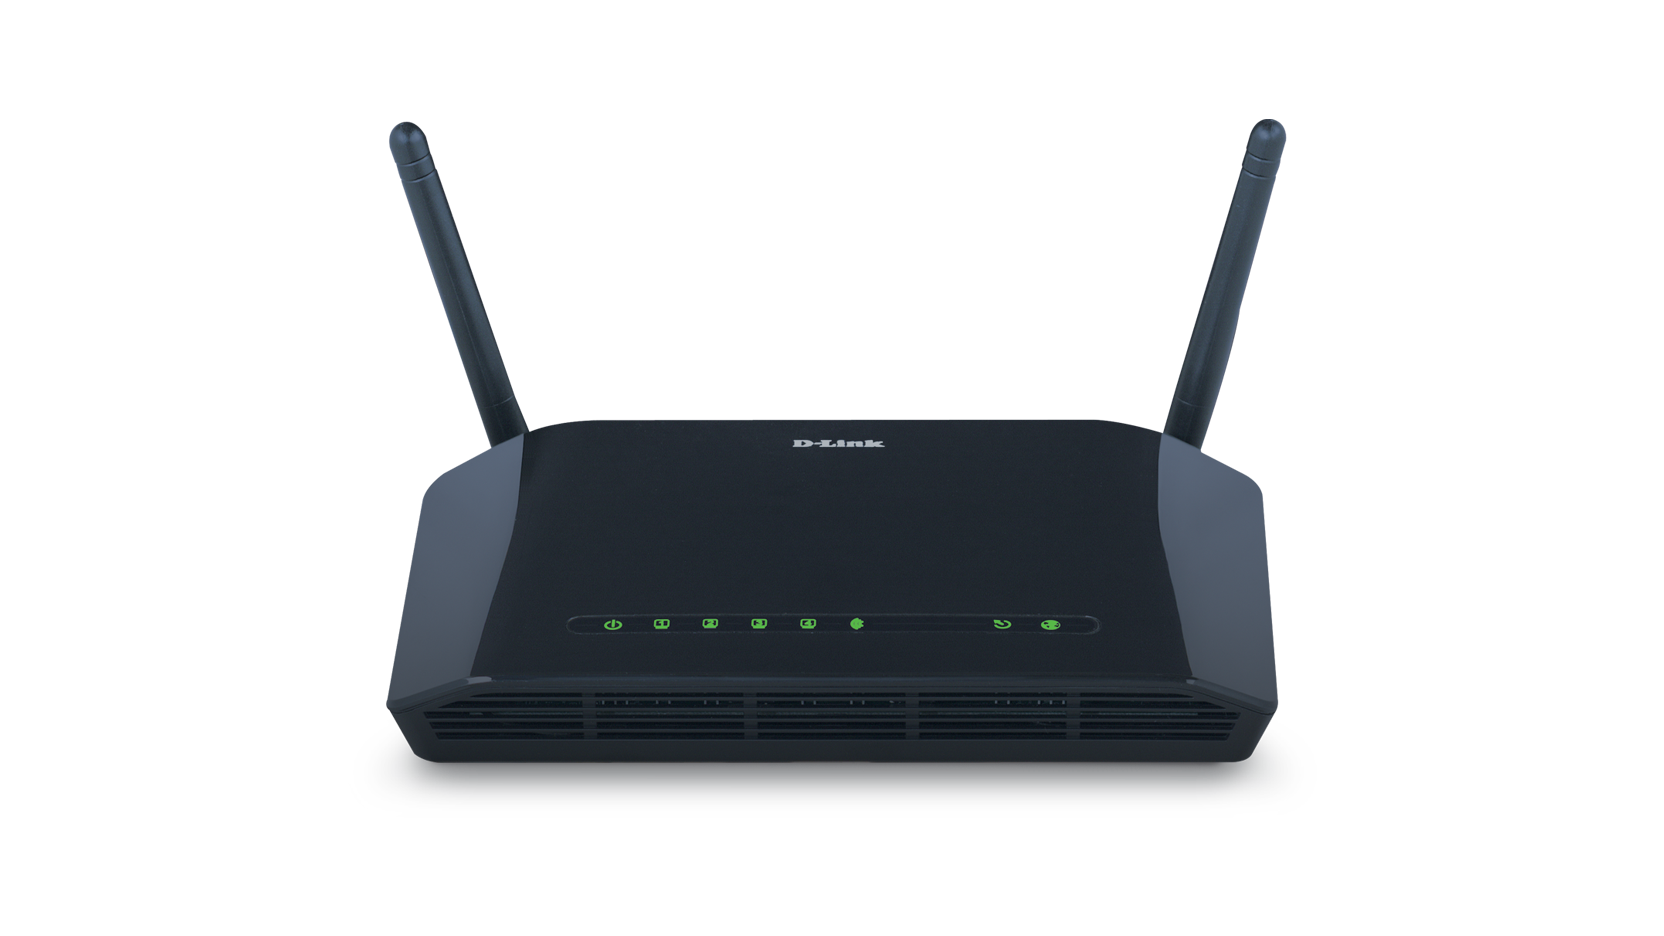 DSL-2740B Wireless N300 ADSL2+ Modem Router | D-Link Sweden